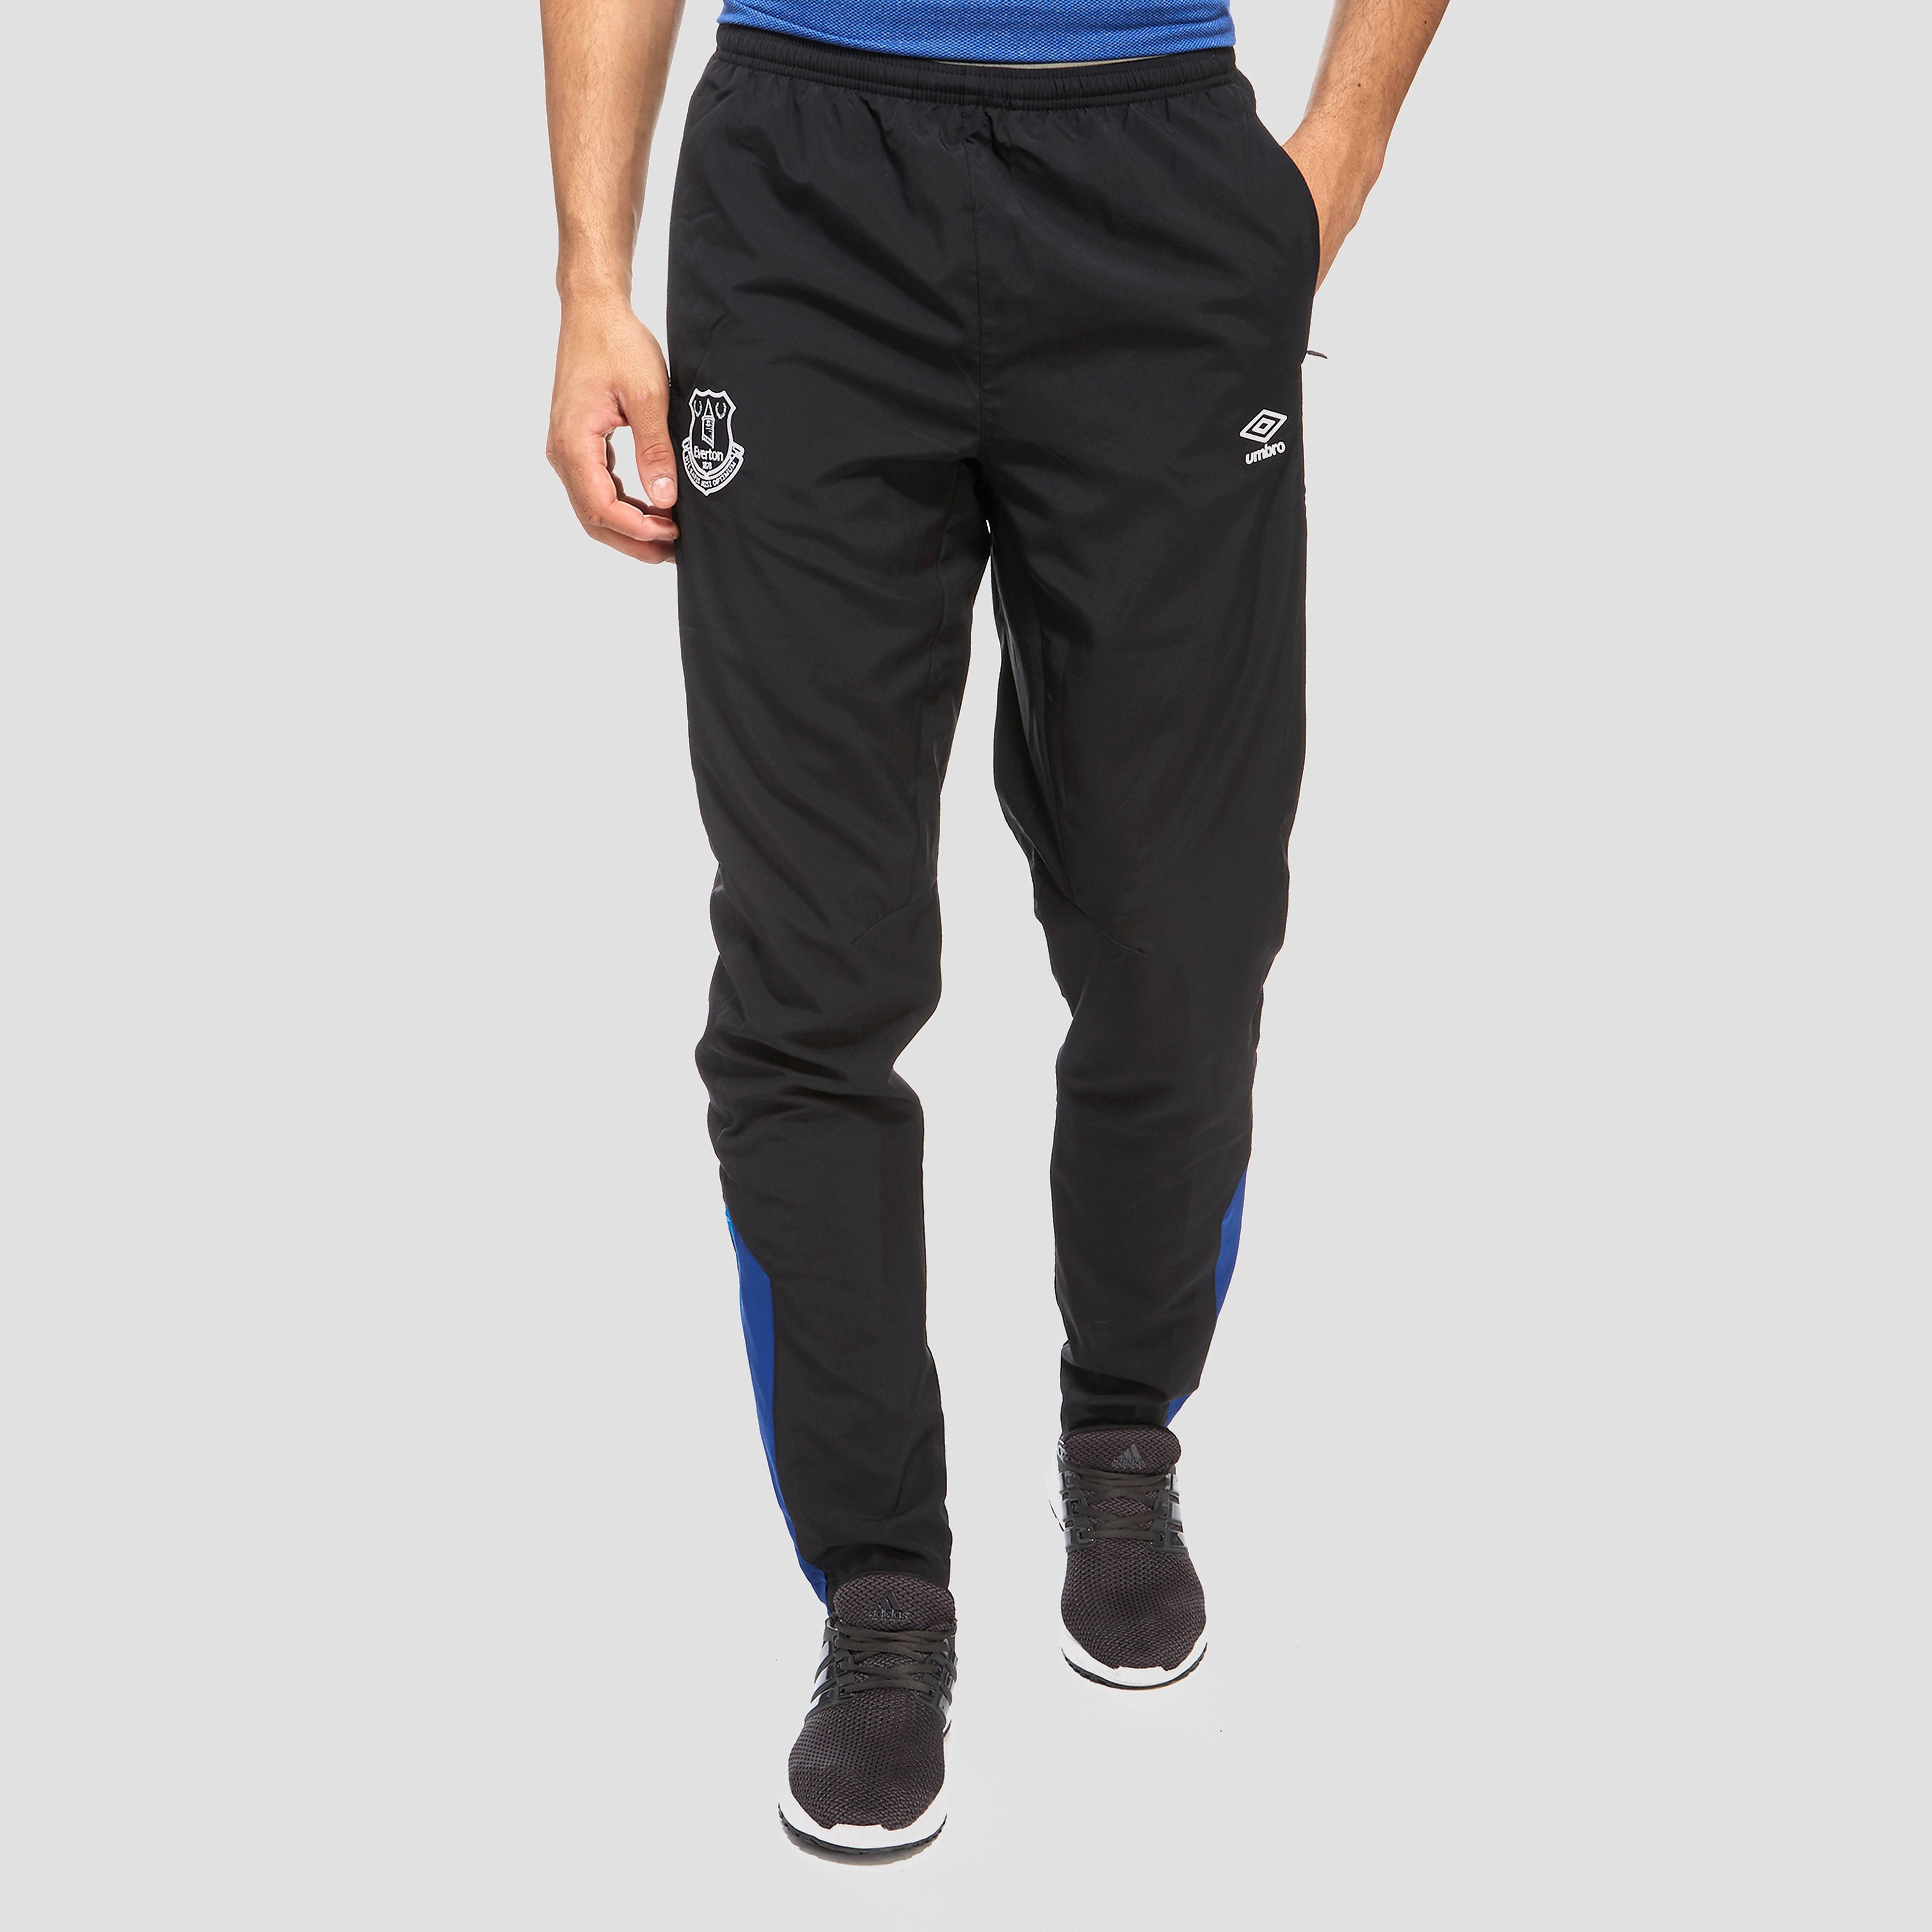 Umbro Everton FC Woven Pants